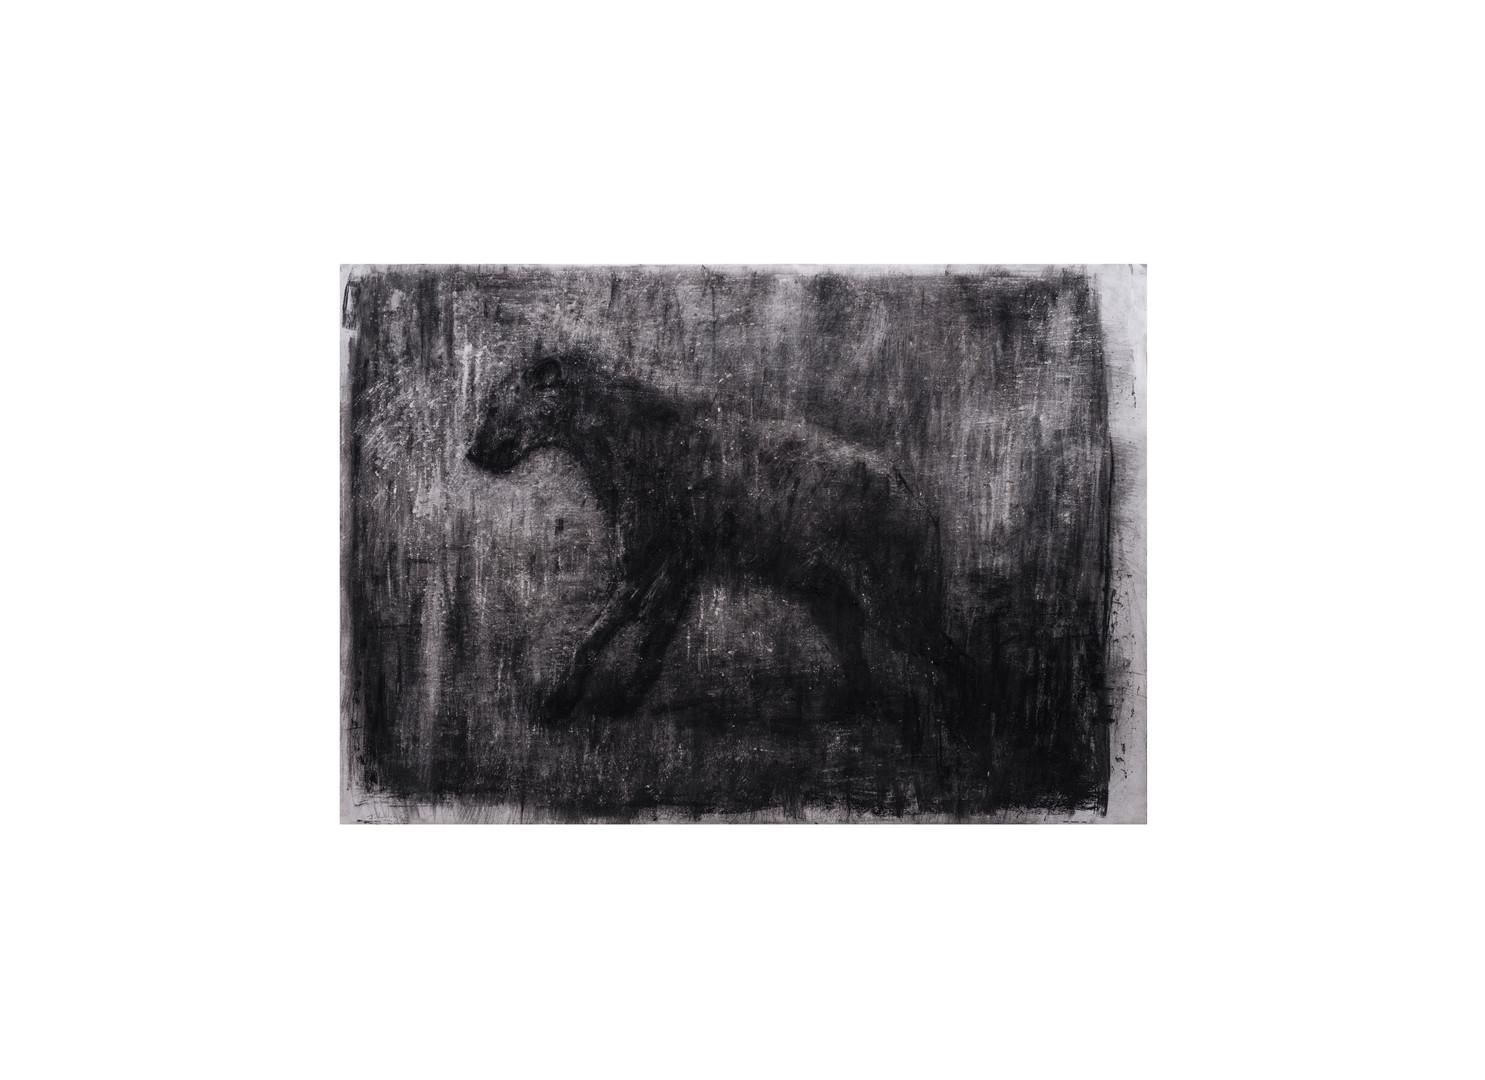 Johann Louw | Groot Hiëna | 2017 | Charcoal on Hahnemühle | 124 x 175 cm